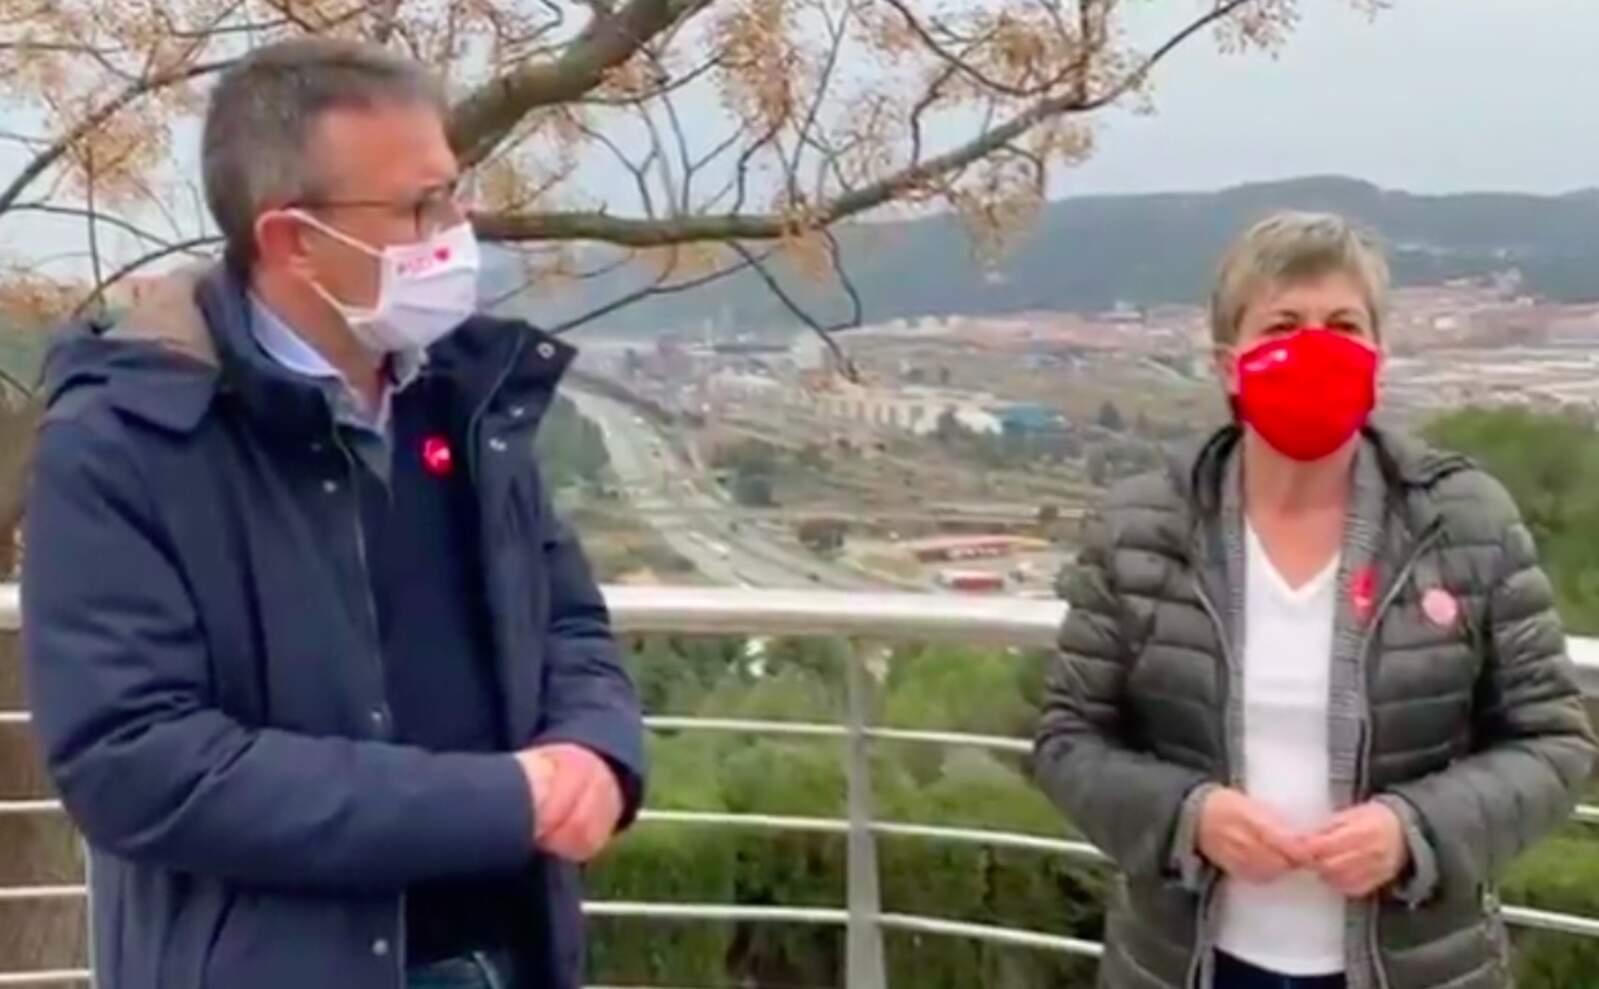 Els dos candidats socialistes Güeto i Candela, han visitat Castellbisbal